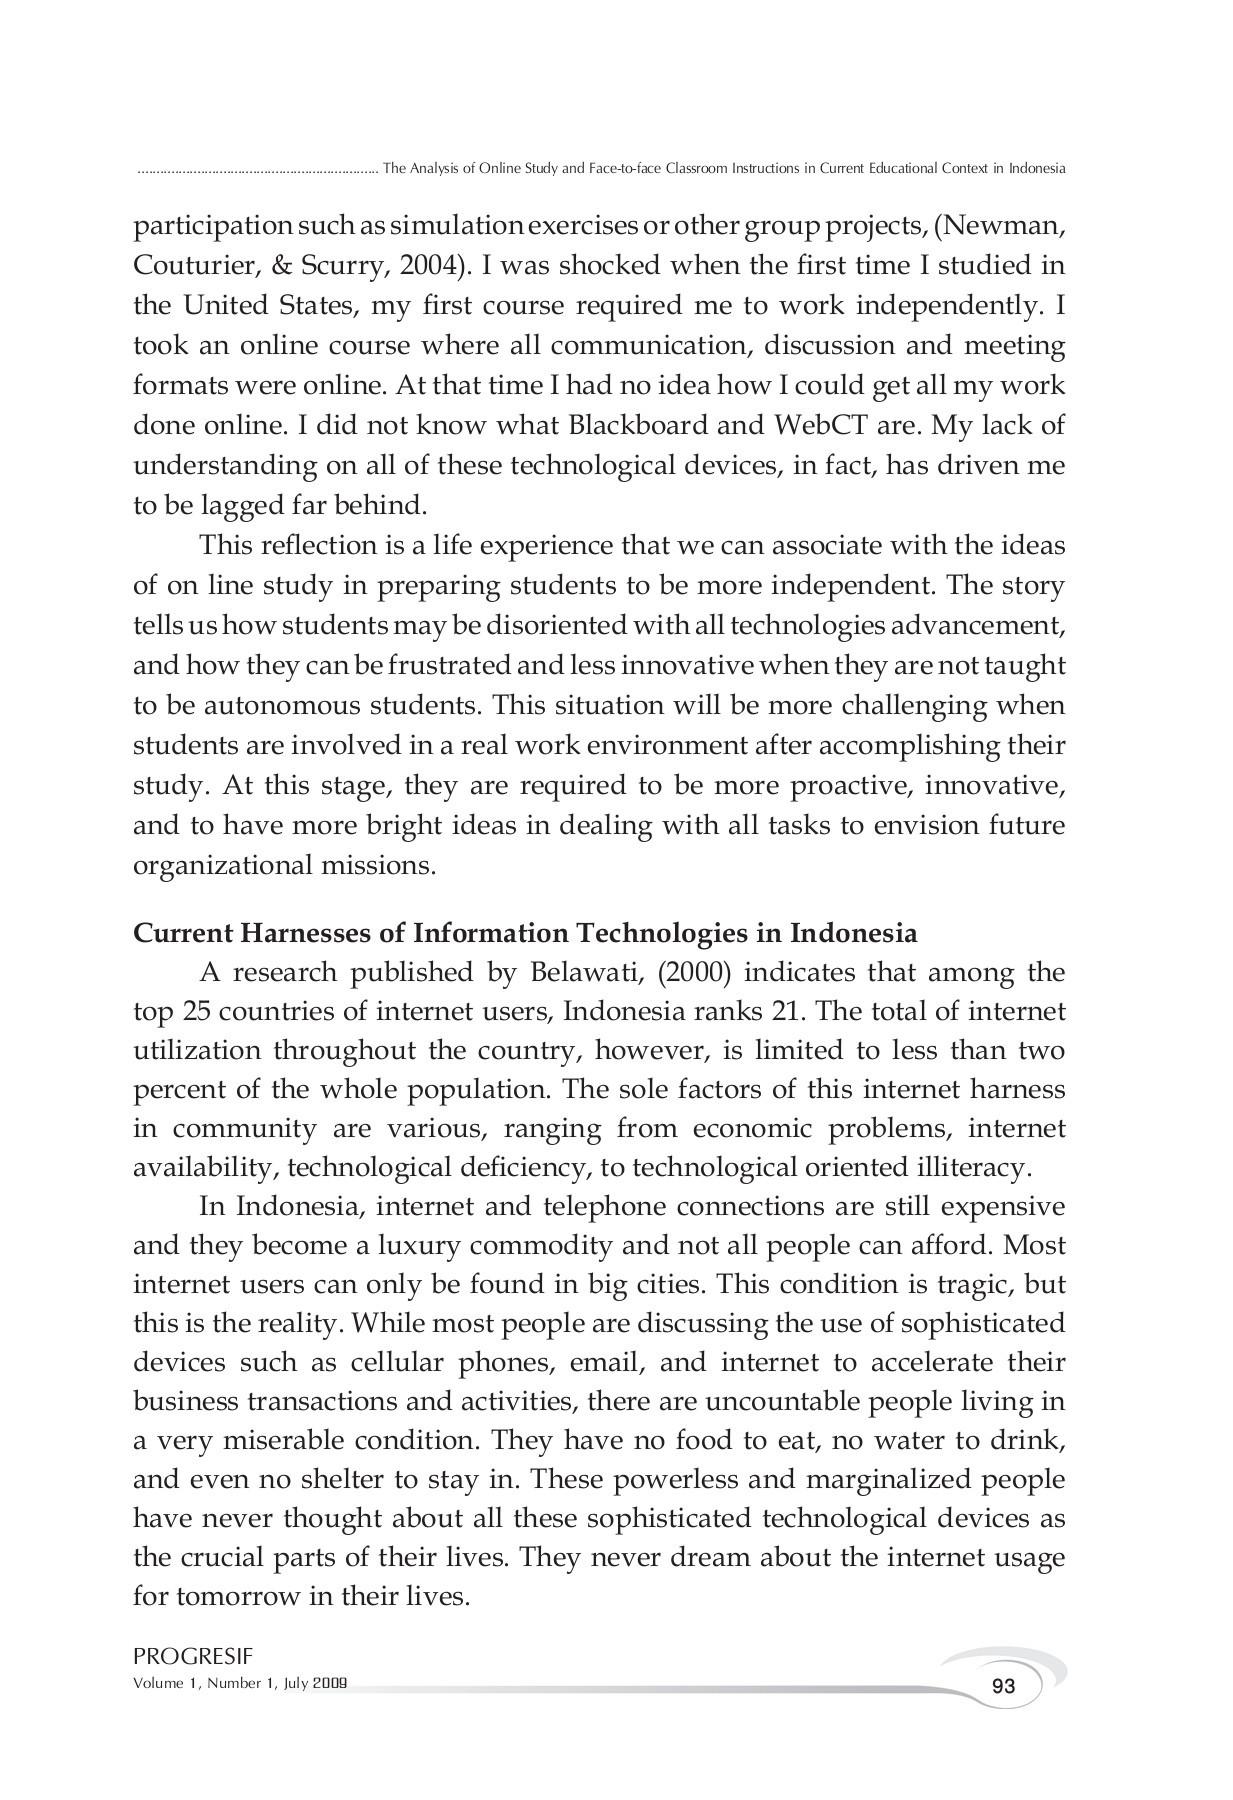 Sustainable development goals (sdgs) atau tujuan pembangunan berkelanjutan, merupakan suatu rencana aksi global yang disepakati oleh para pemimpin dunia, termasuk indonesia, guna mengakhiri kemiskinan, mengurangi kesenjangan dan melindungi lingkungan. Jurnal Progresif 01 2009 Flip Book Pages 101 150 Pubhtml5